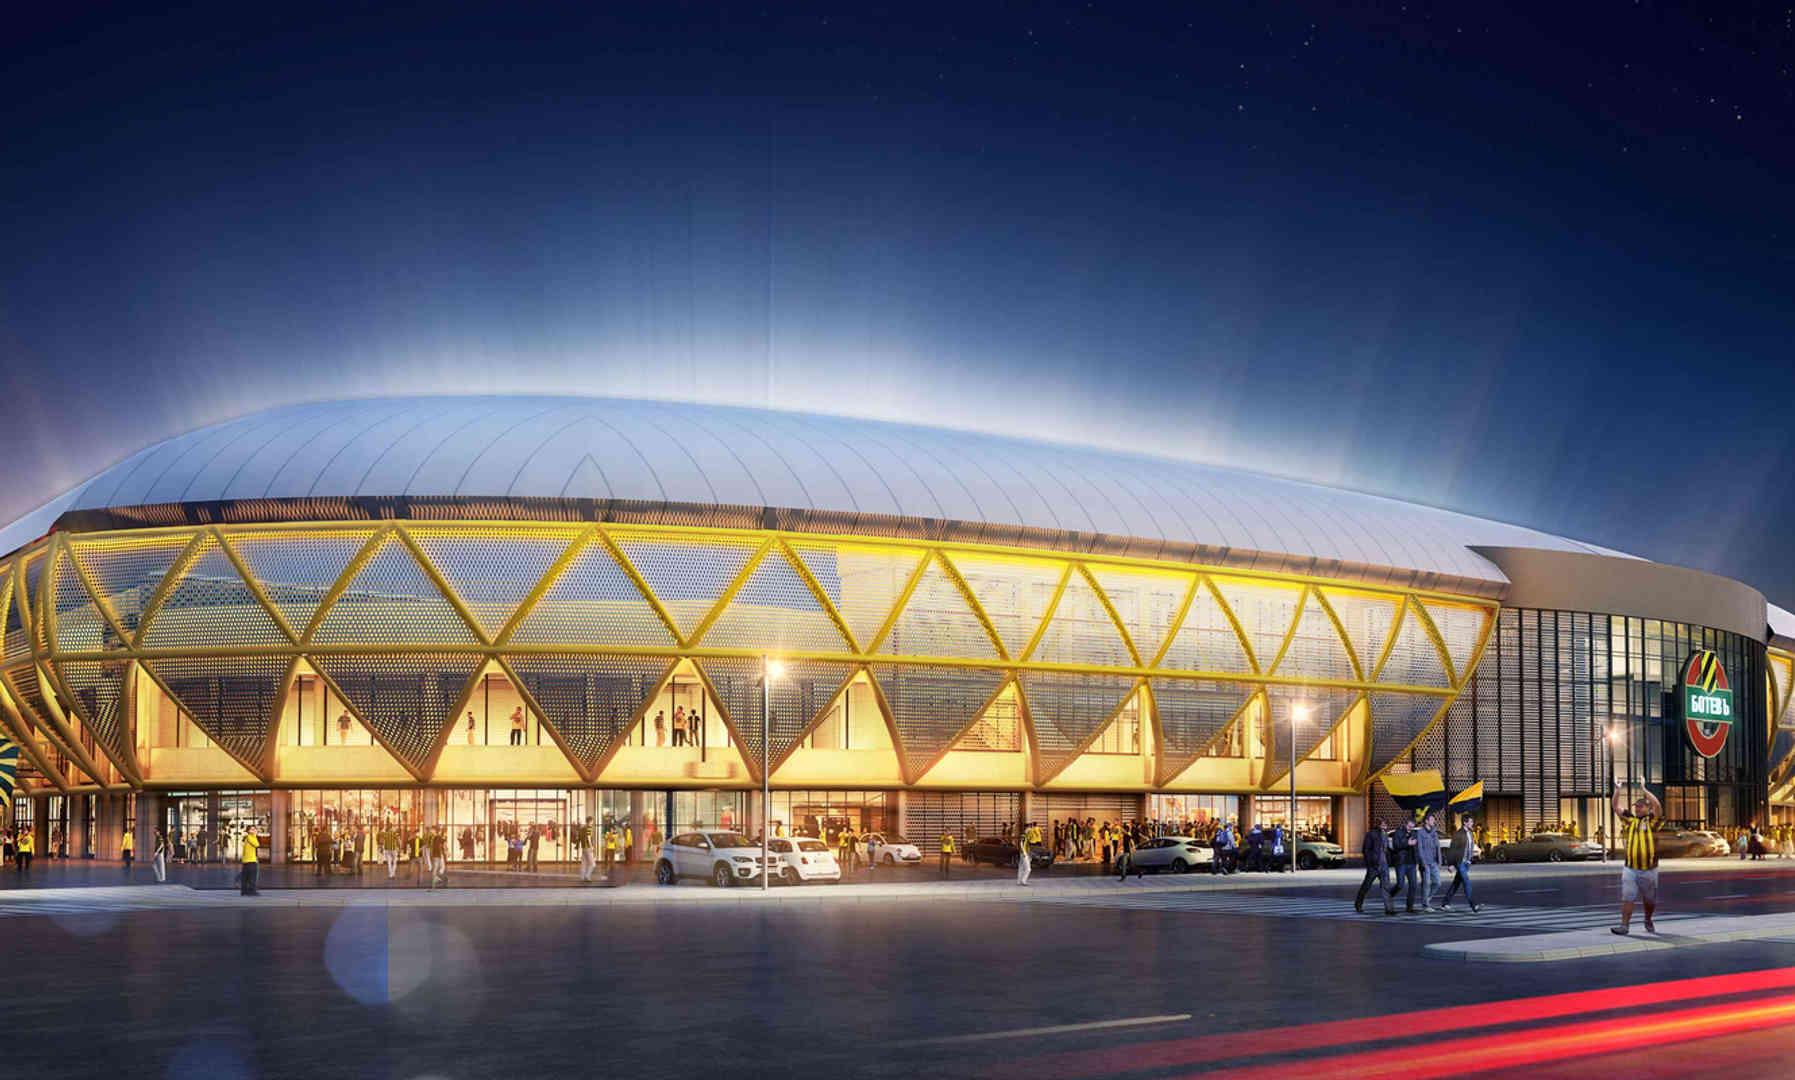 Vamos_Botev_Stadion_CGI03_02a.jpg